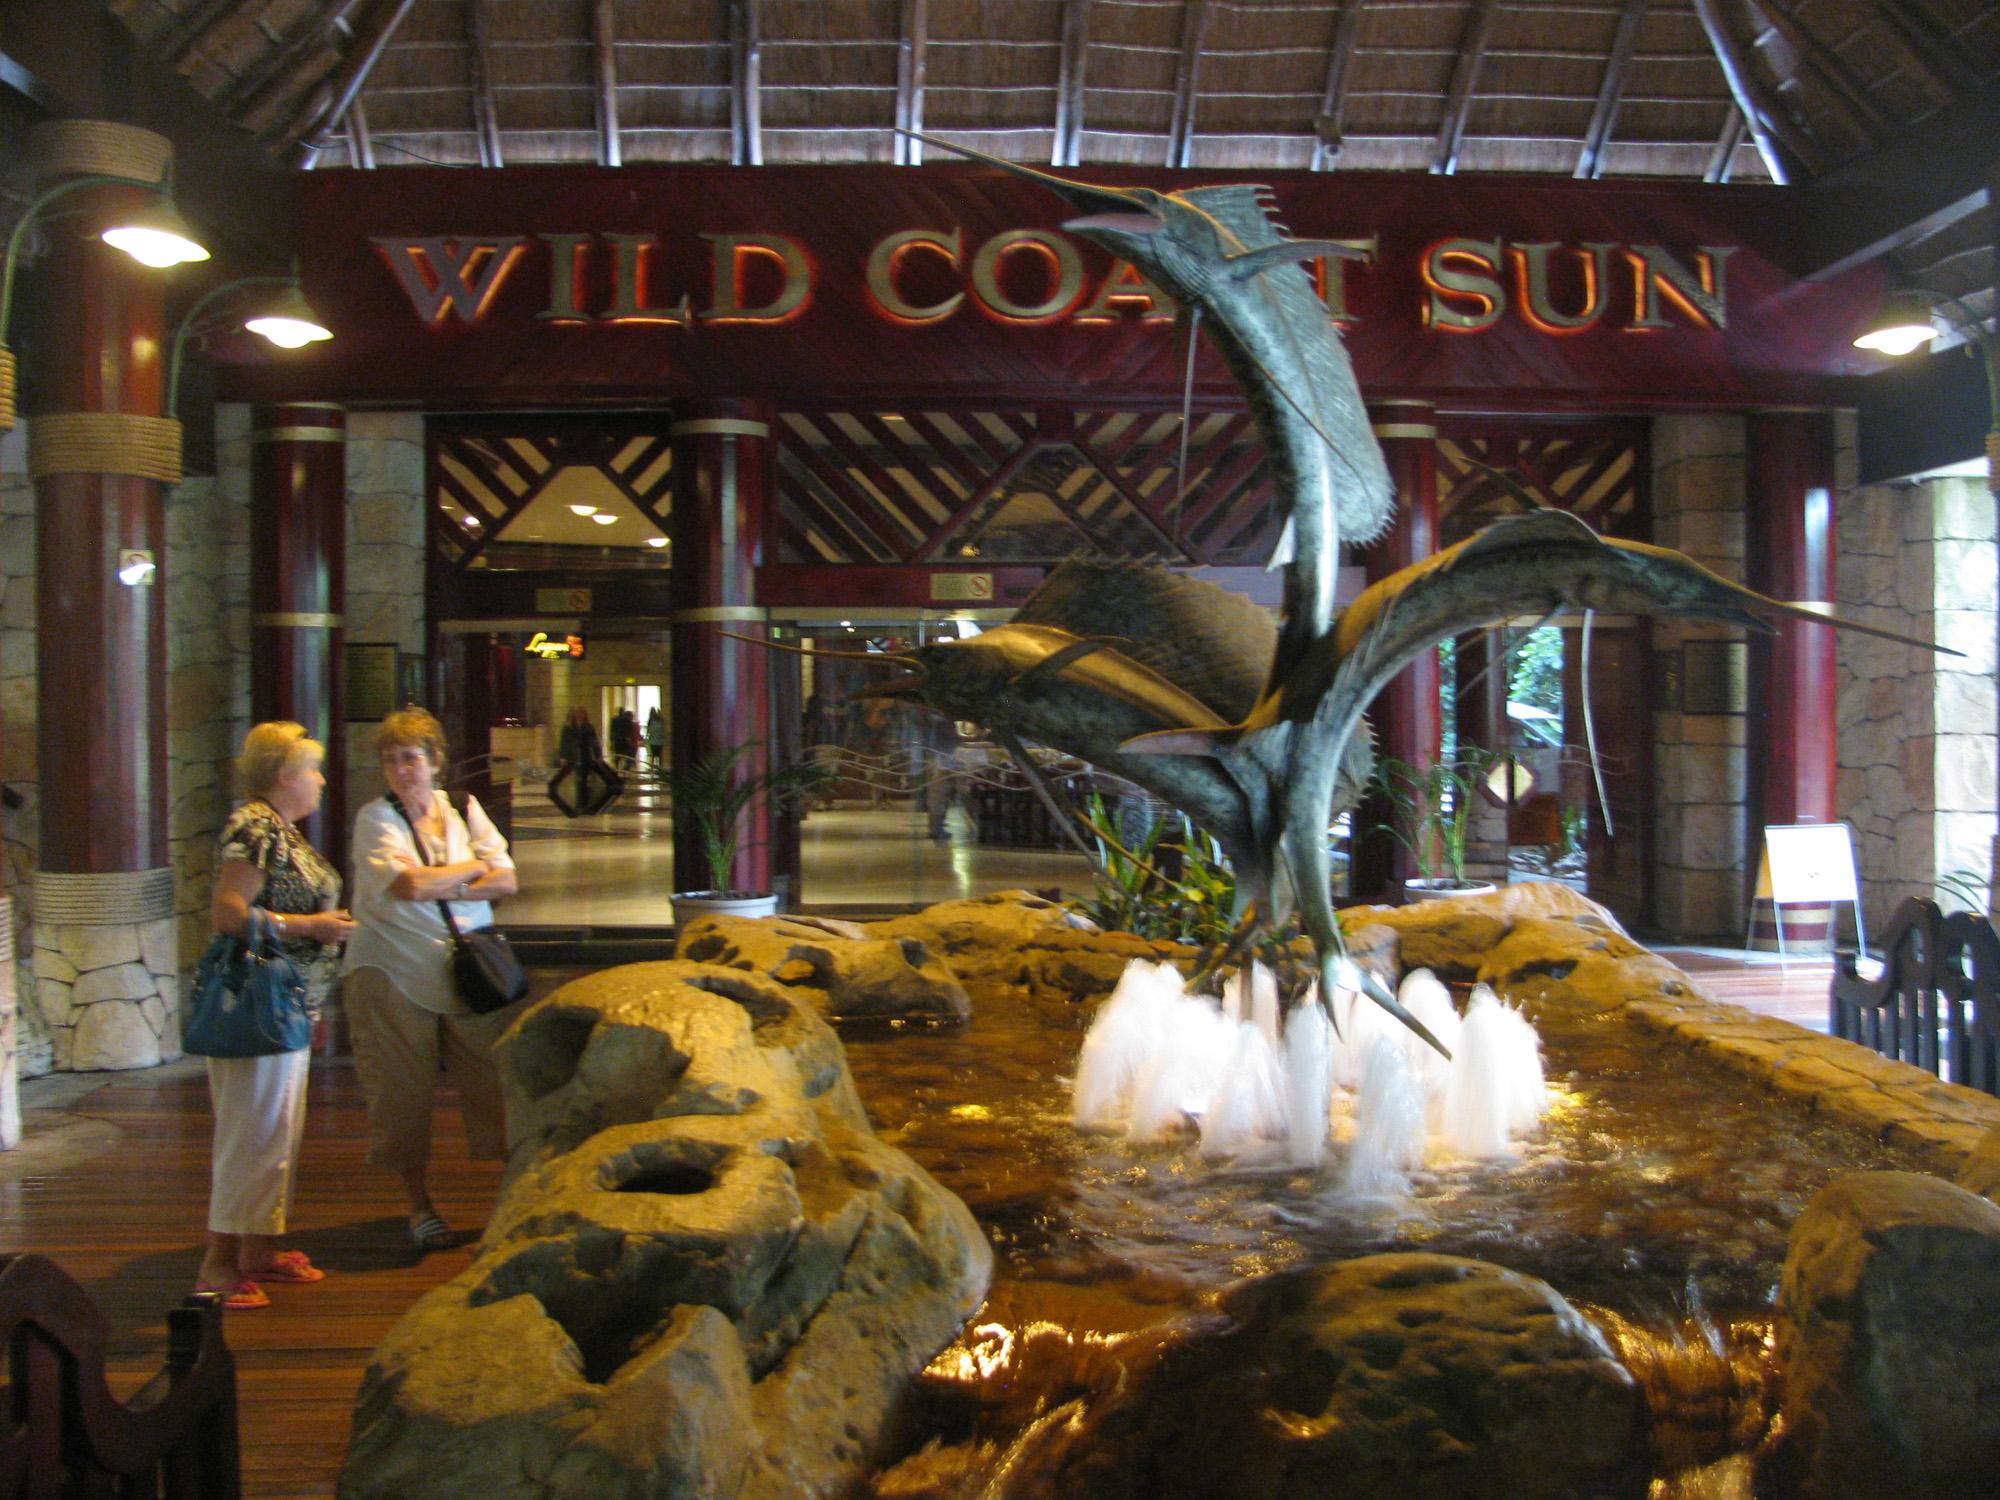 Wild coast sun resort & casino port edwards